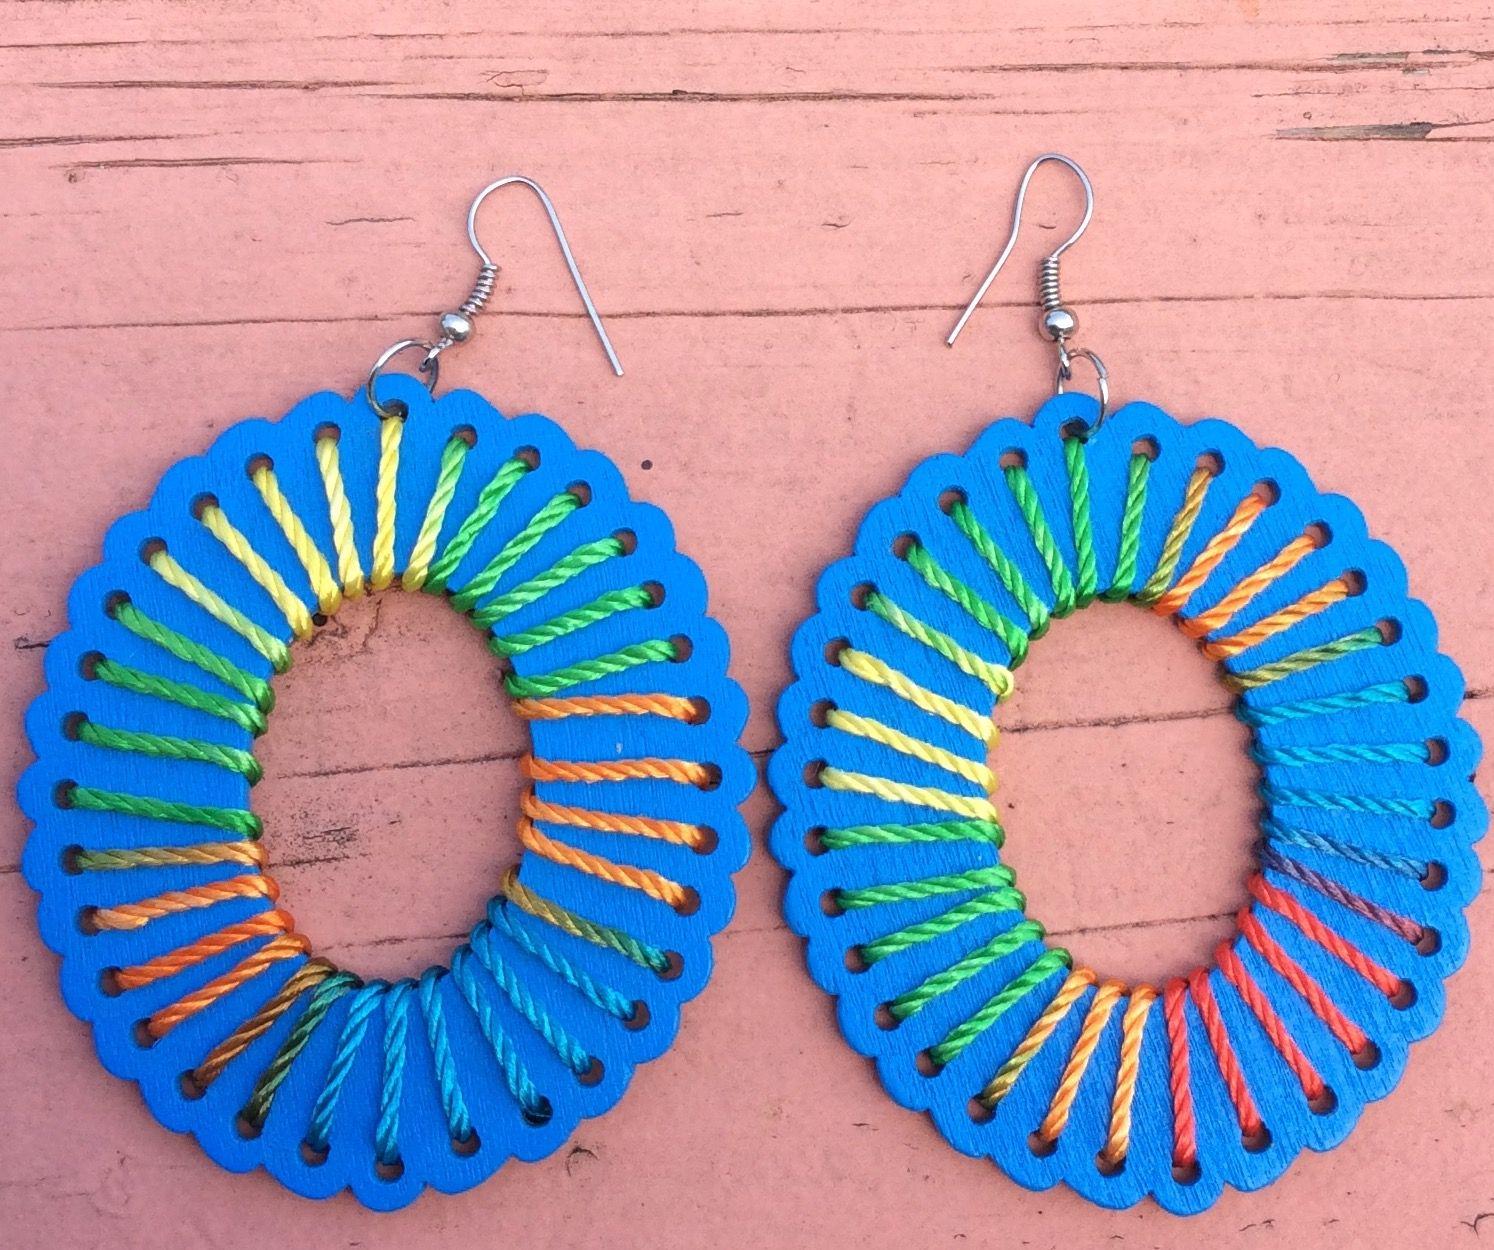 Fun wood and string Kenya earrings. Visit kenecoshop.storenvy.com to see more styles